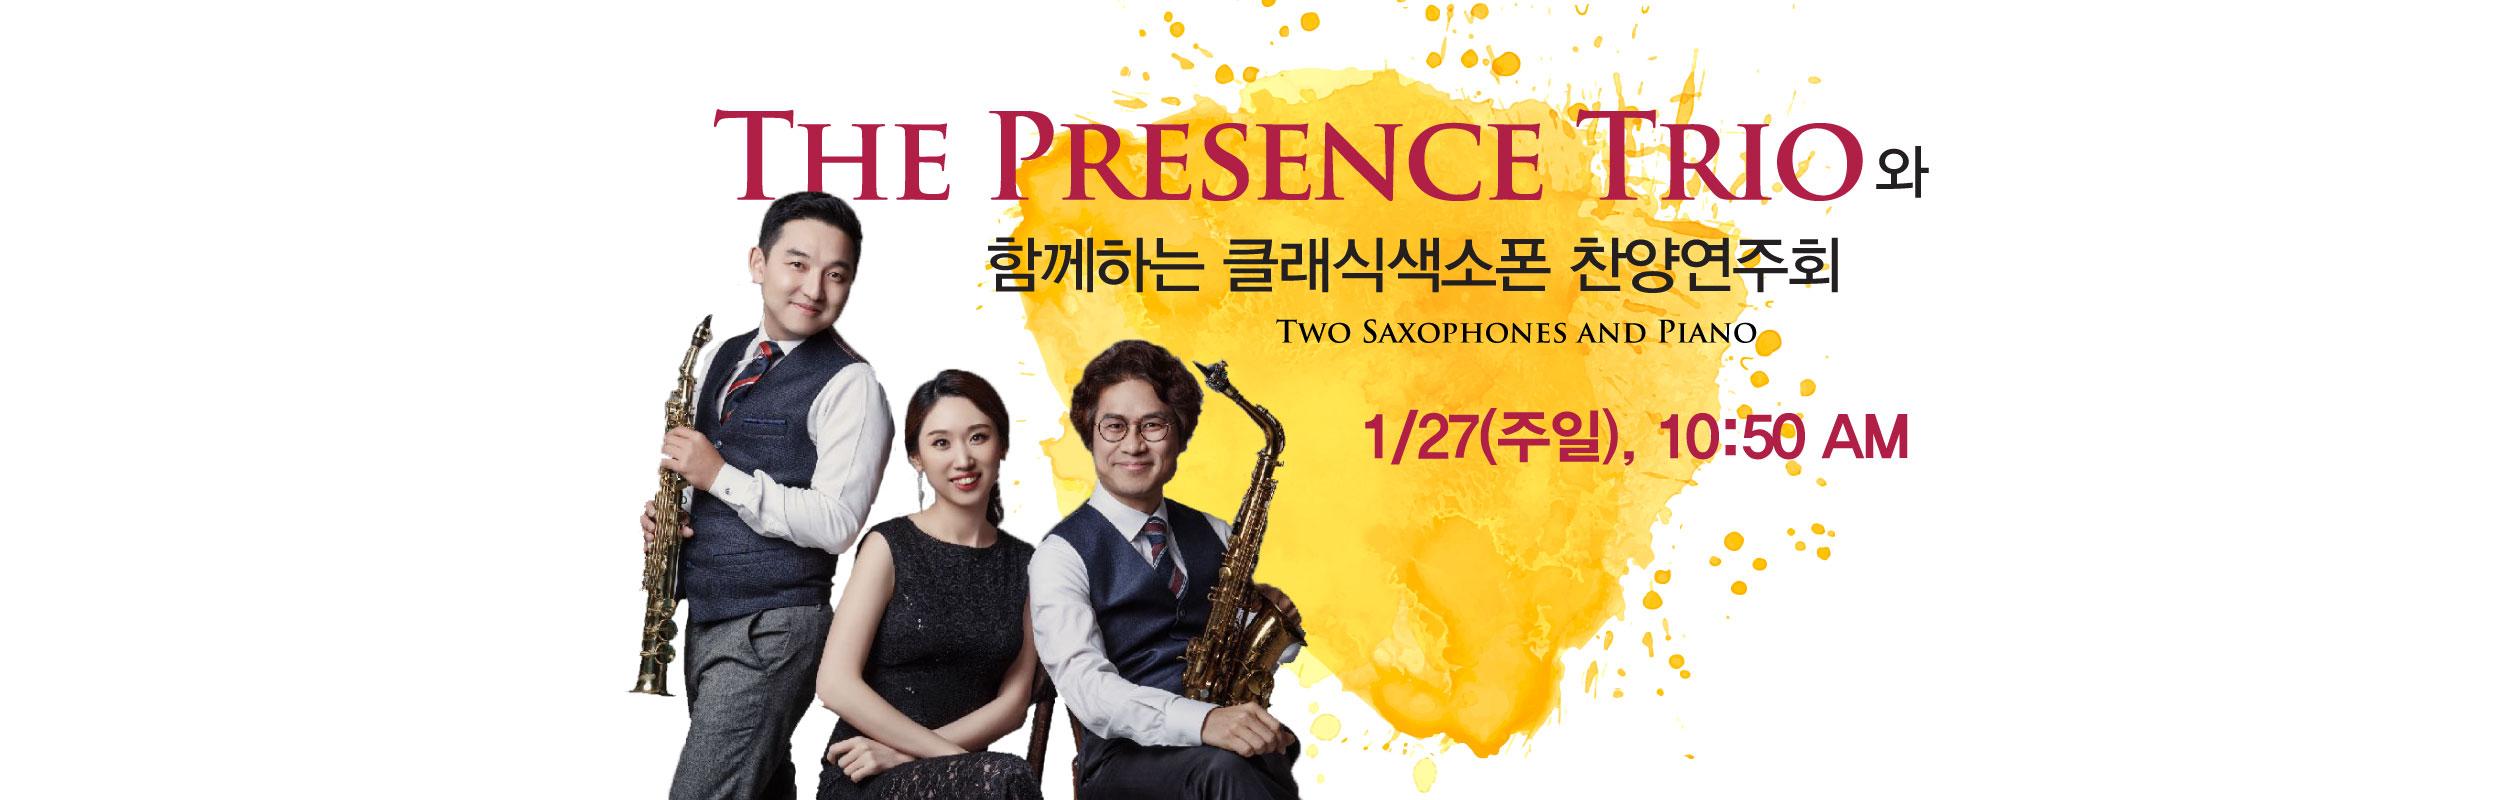 The Presence Trio와 함께하는 클…